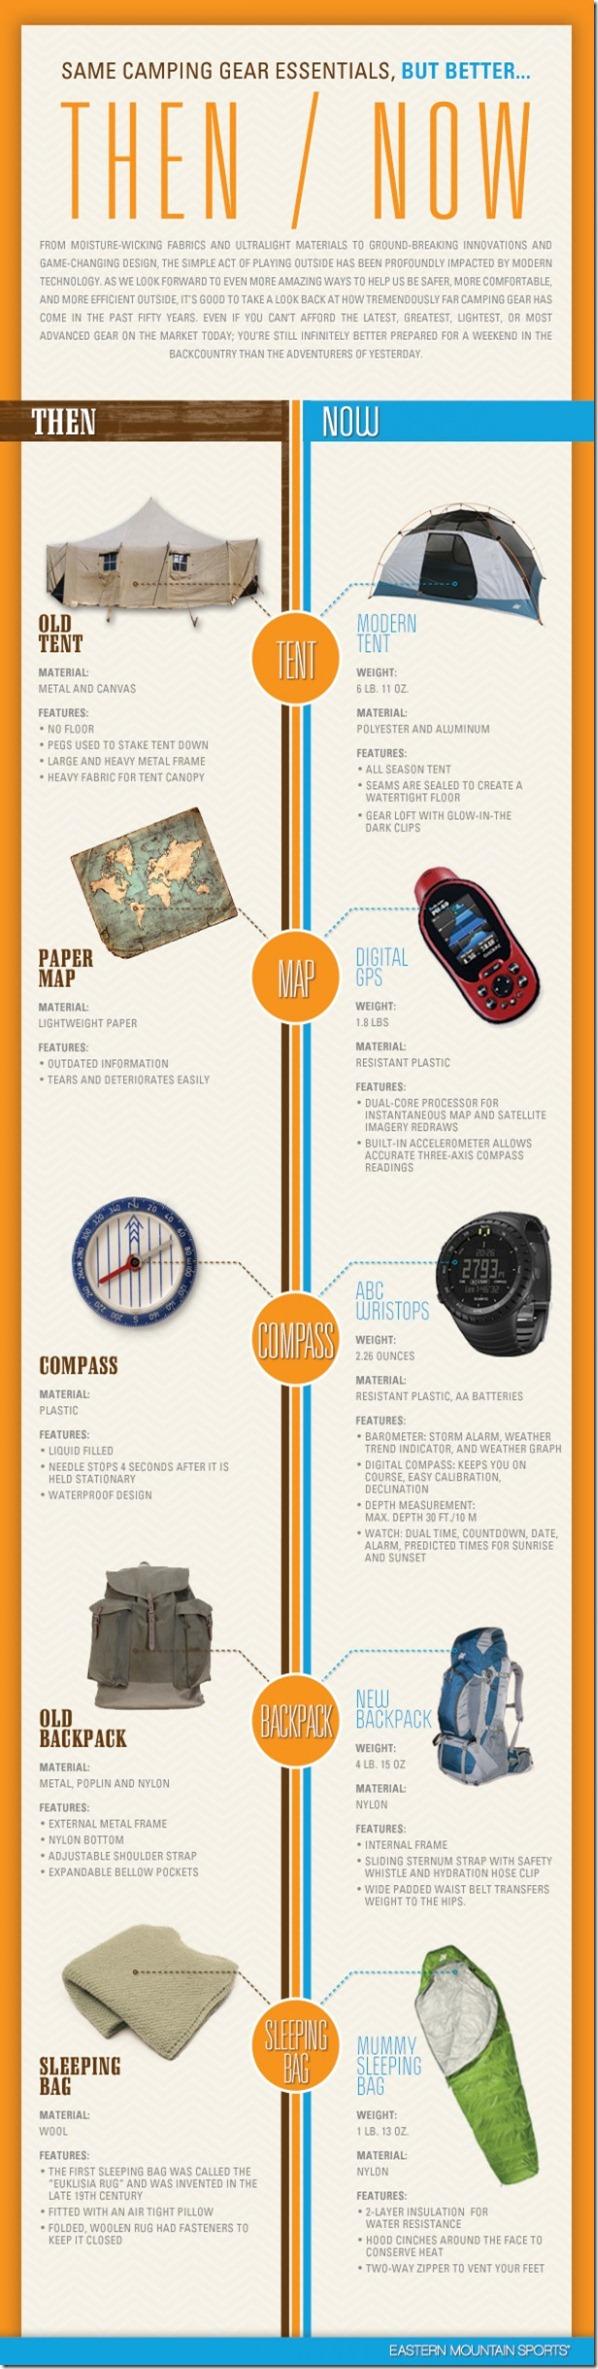 then-now-same-camping-gear-essentials-but-better_50290ba62b014_w594